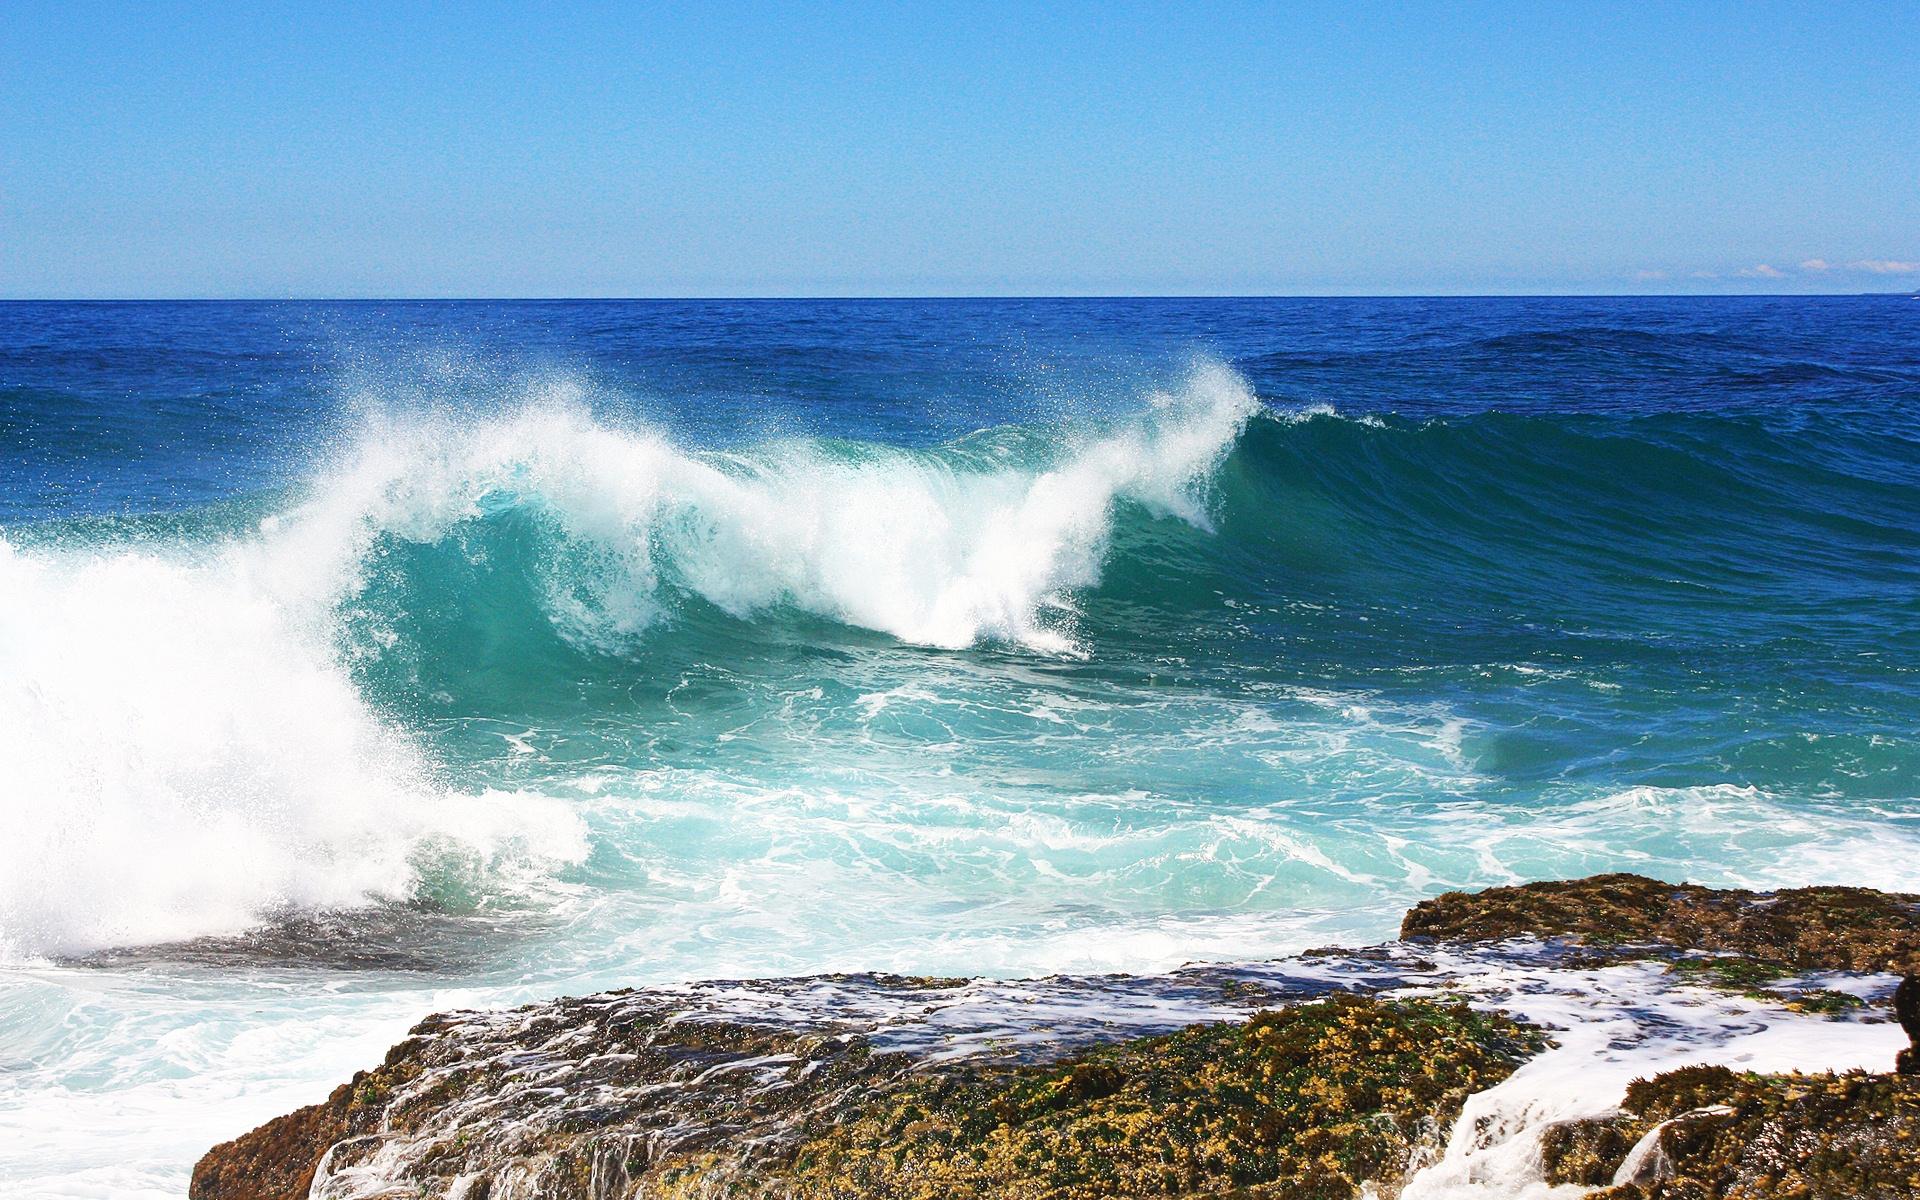 Sea Waves wallpaper 66464 1920x1200